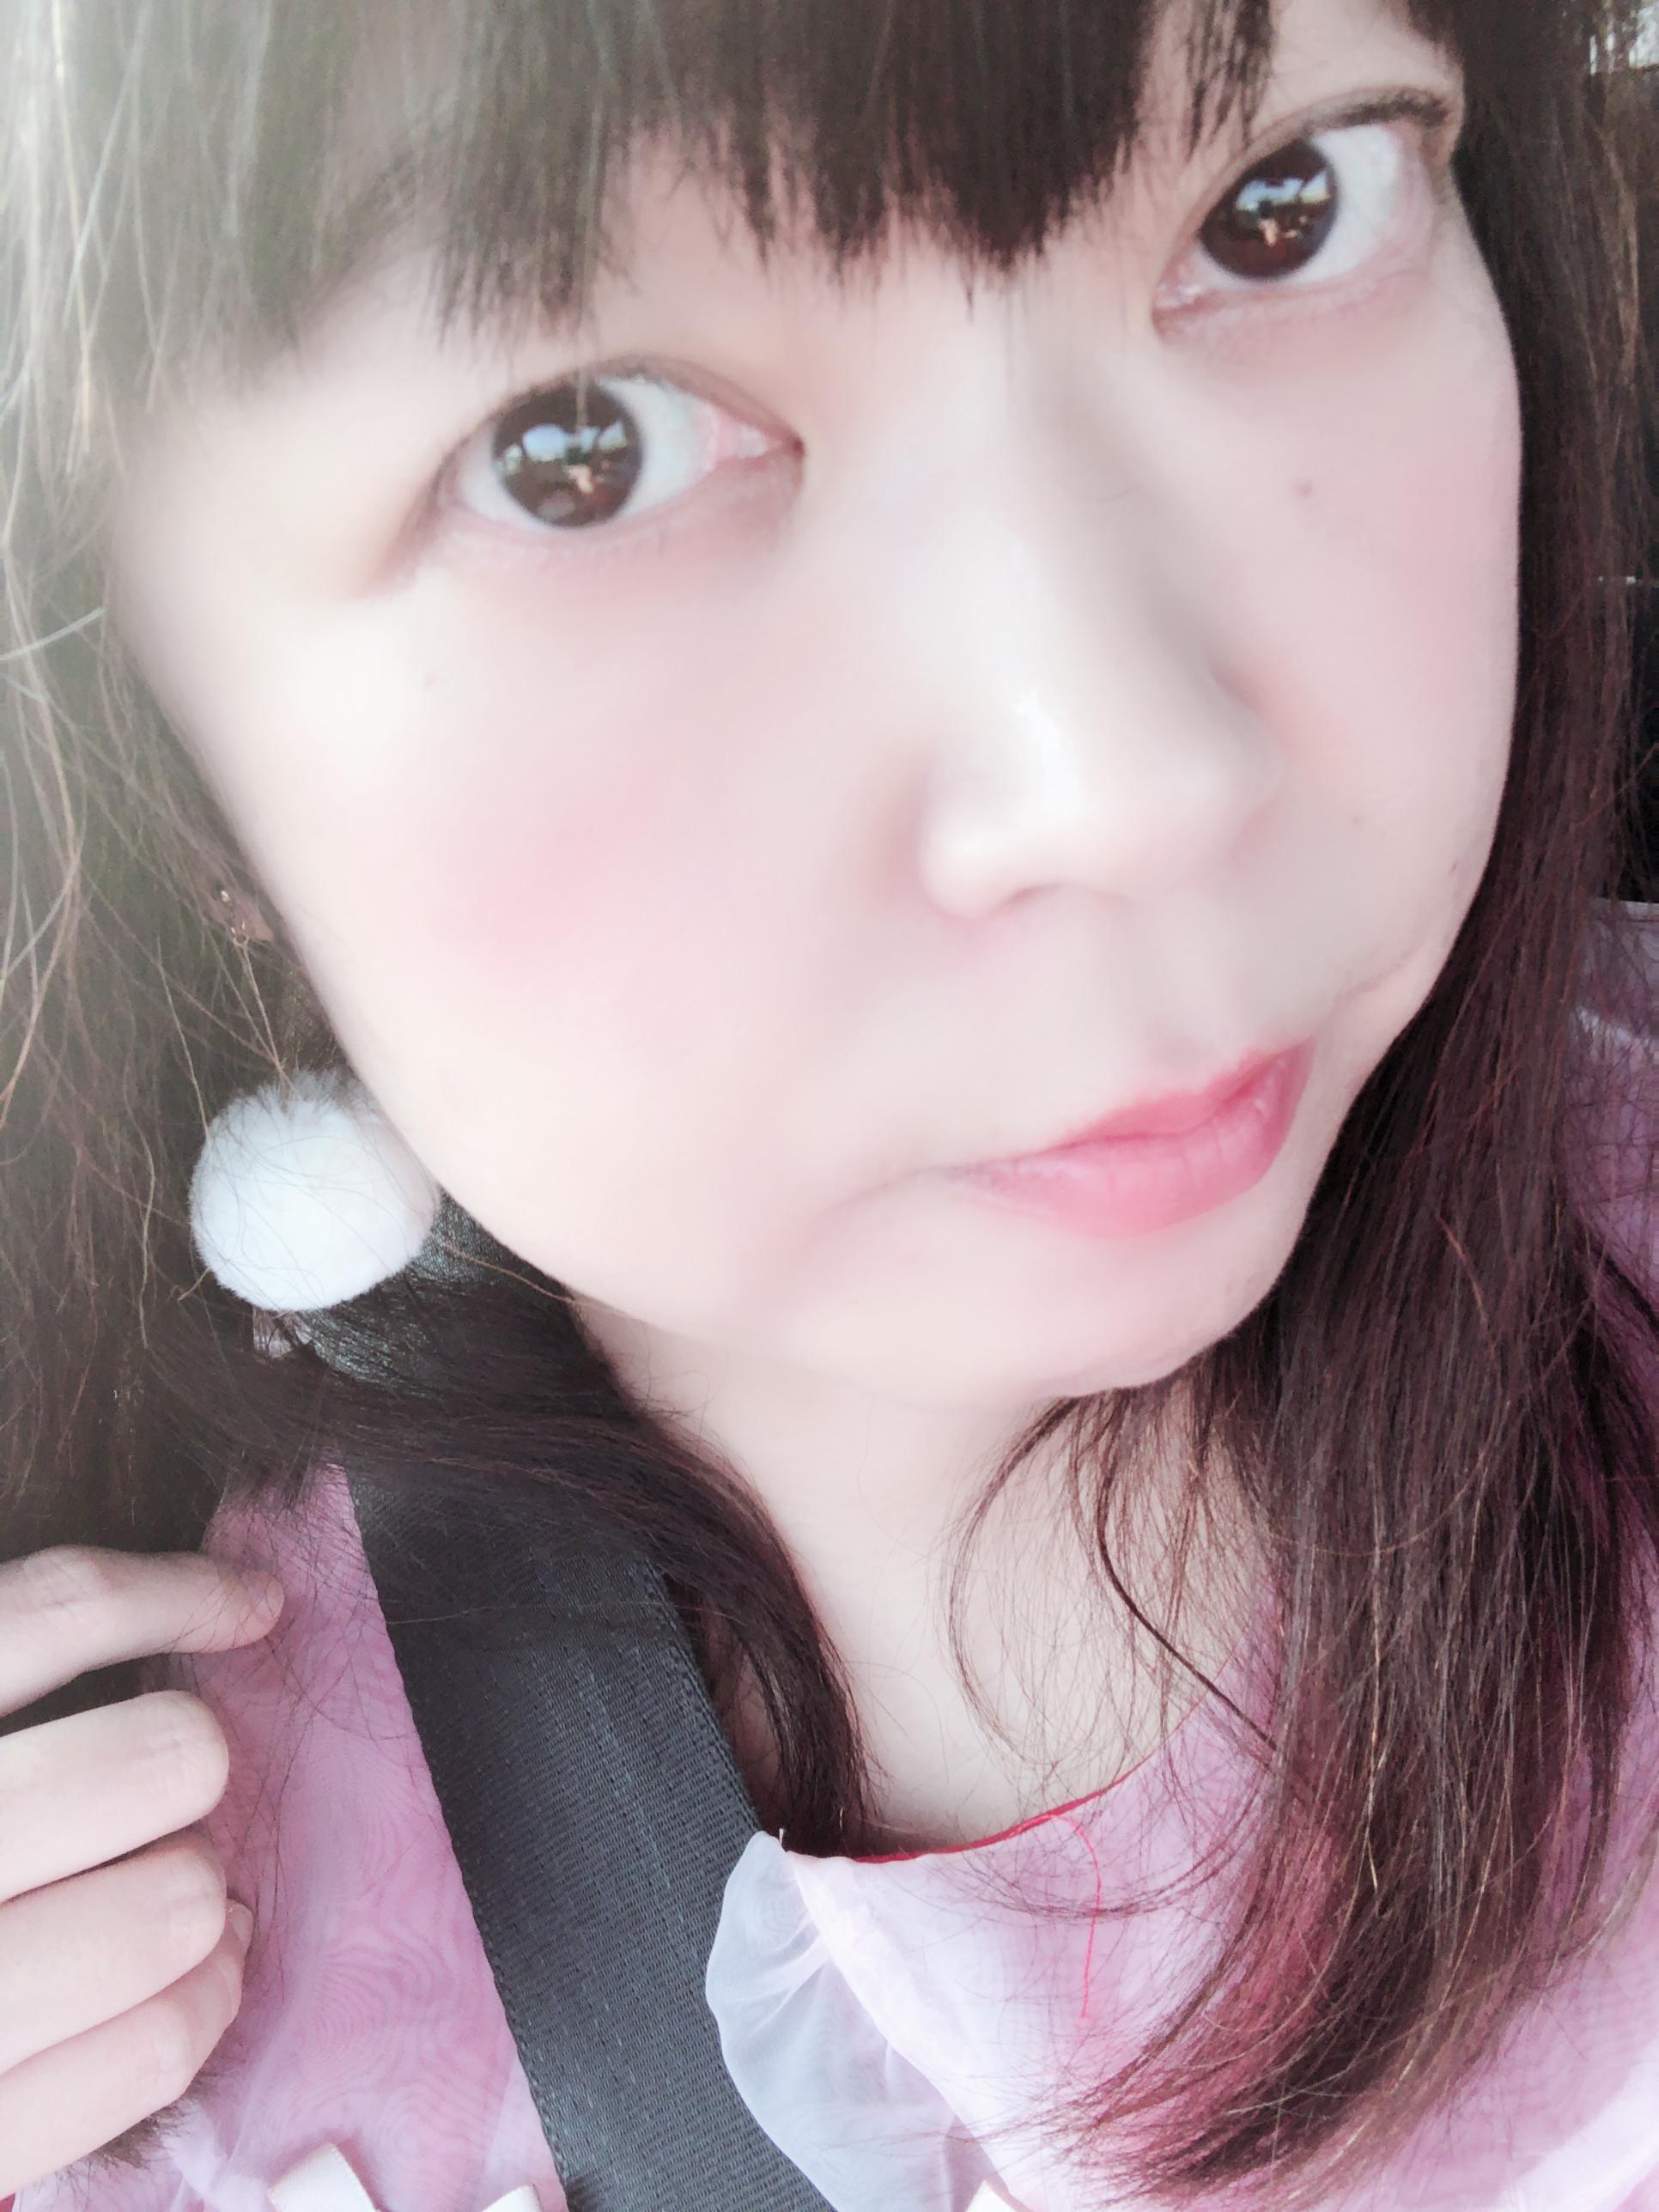 「Hello( *´﹀` *)」12/05(12/05) 16:51 | 新島(にいじま)の写メ・風俗動画